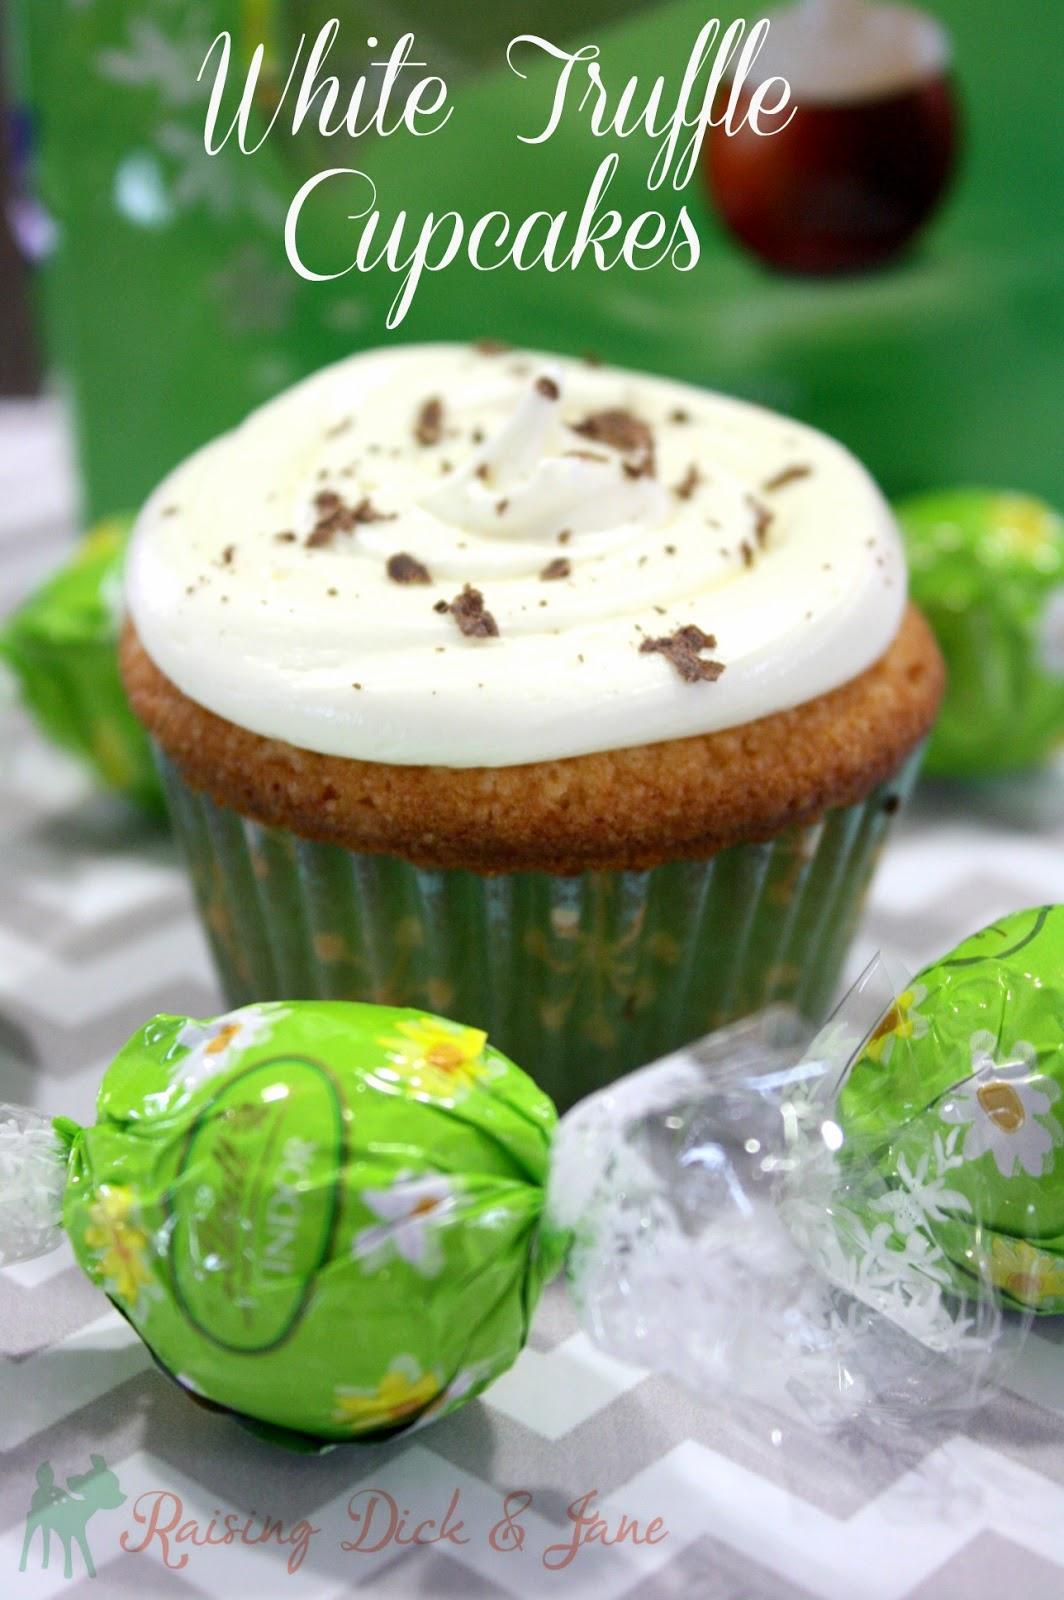 #ad #LindtGOLDBUNNY White Truffle Cupcakes